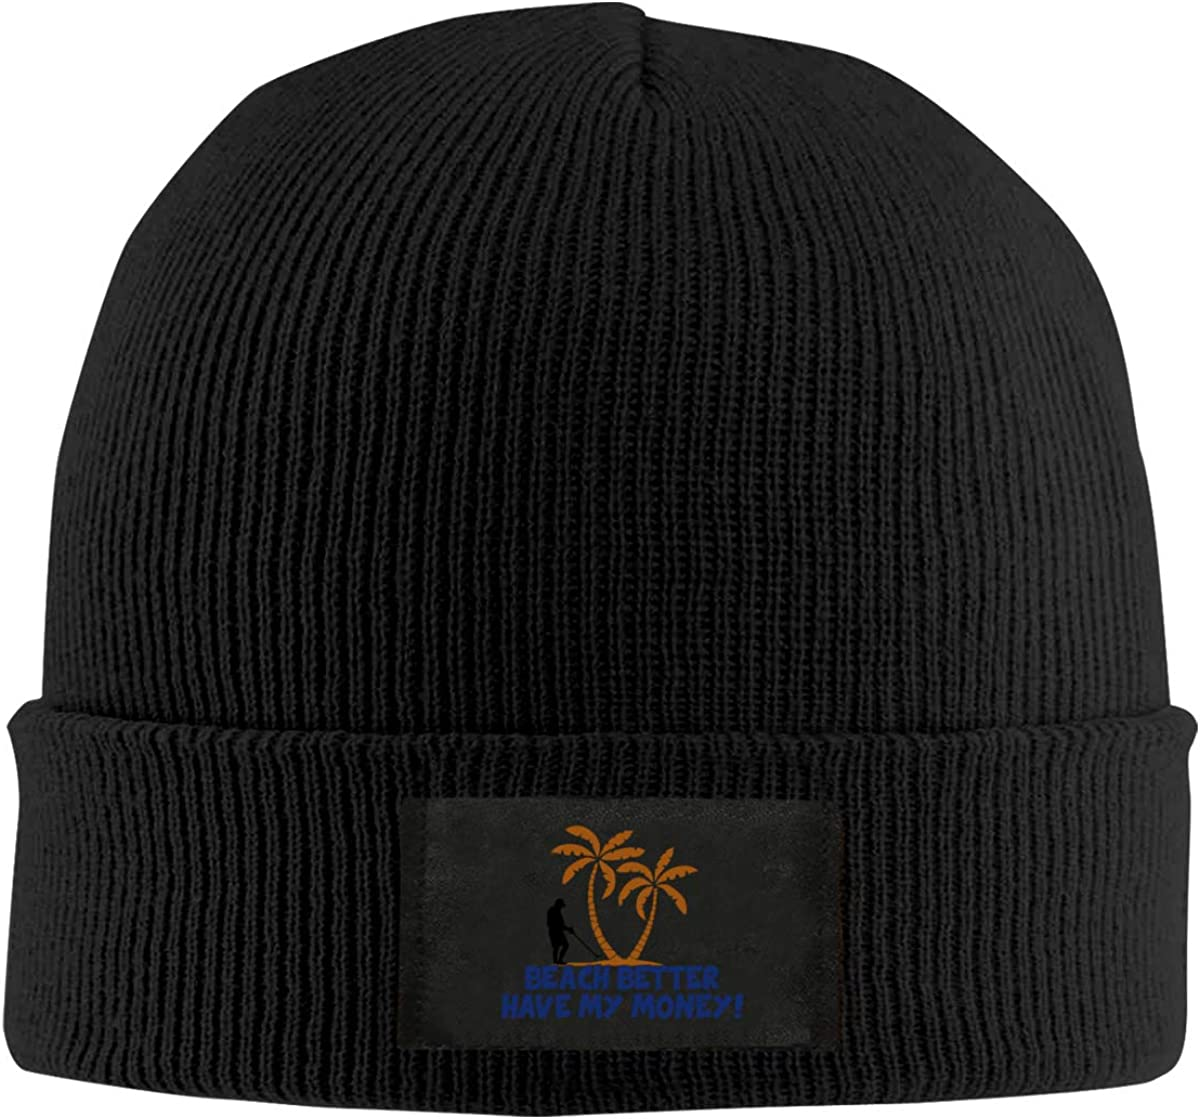 Negi Dad Joke Still Loading Please Wait Knitted Caps Beanies Hats Unisex Gifts